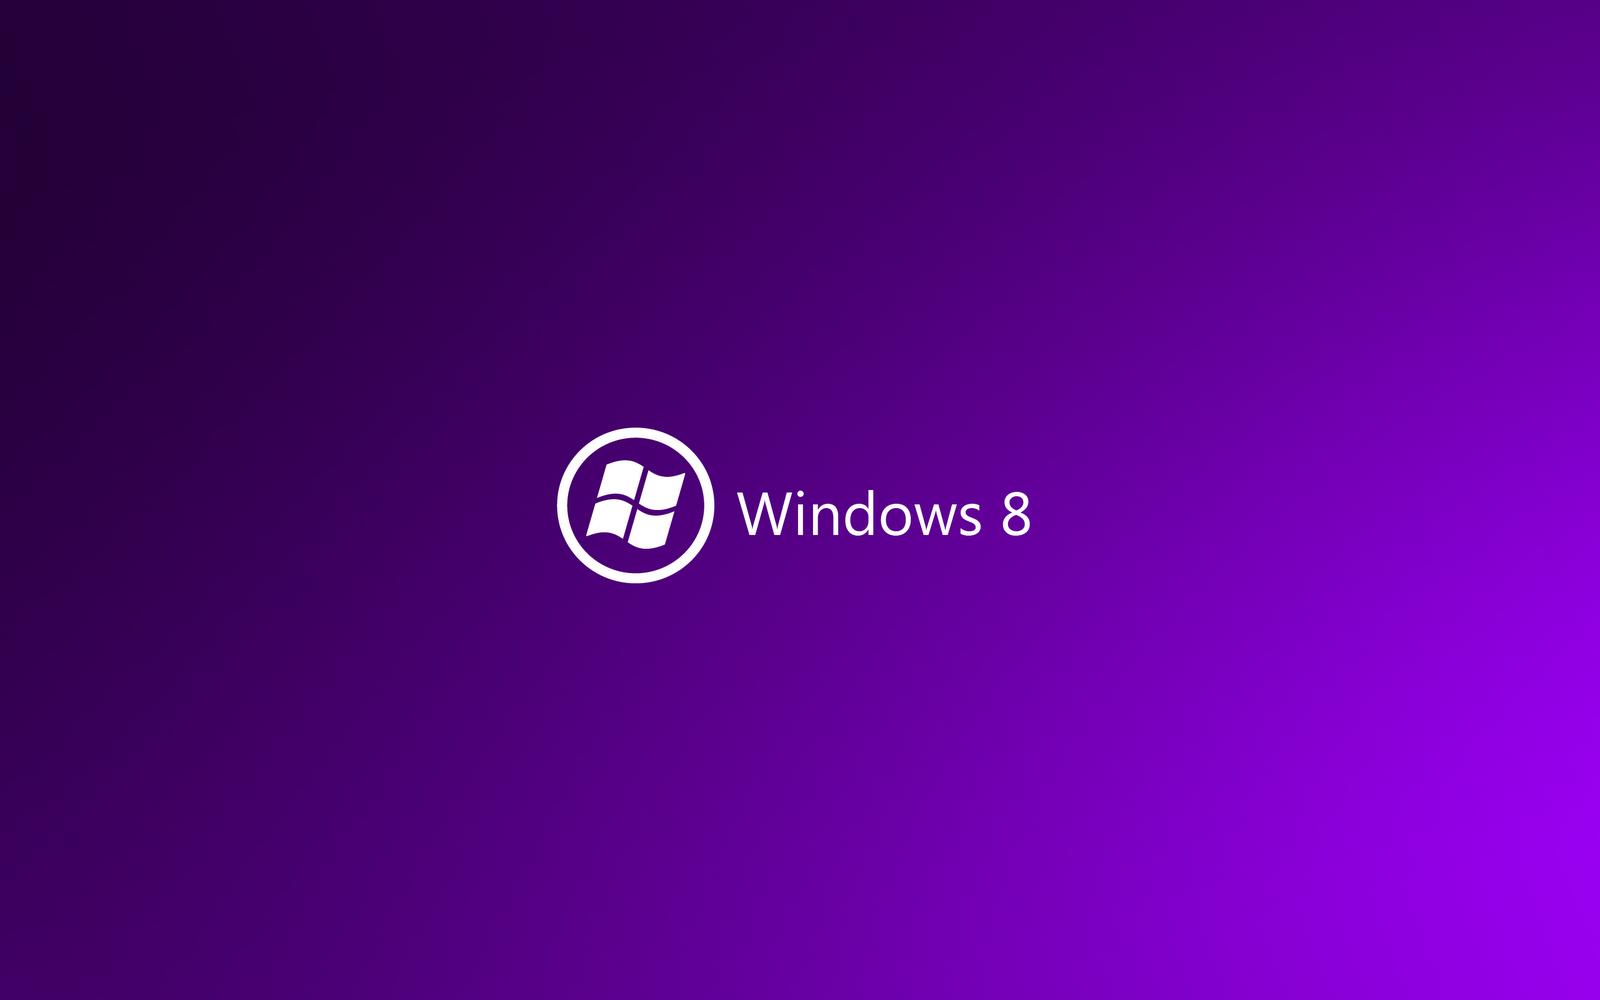 hd wallpapers inbox windows -#main